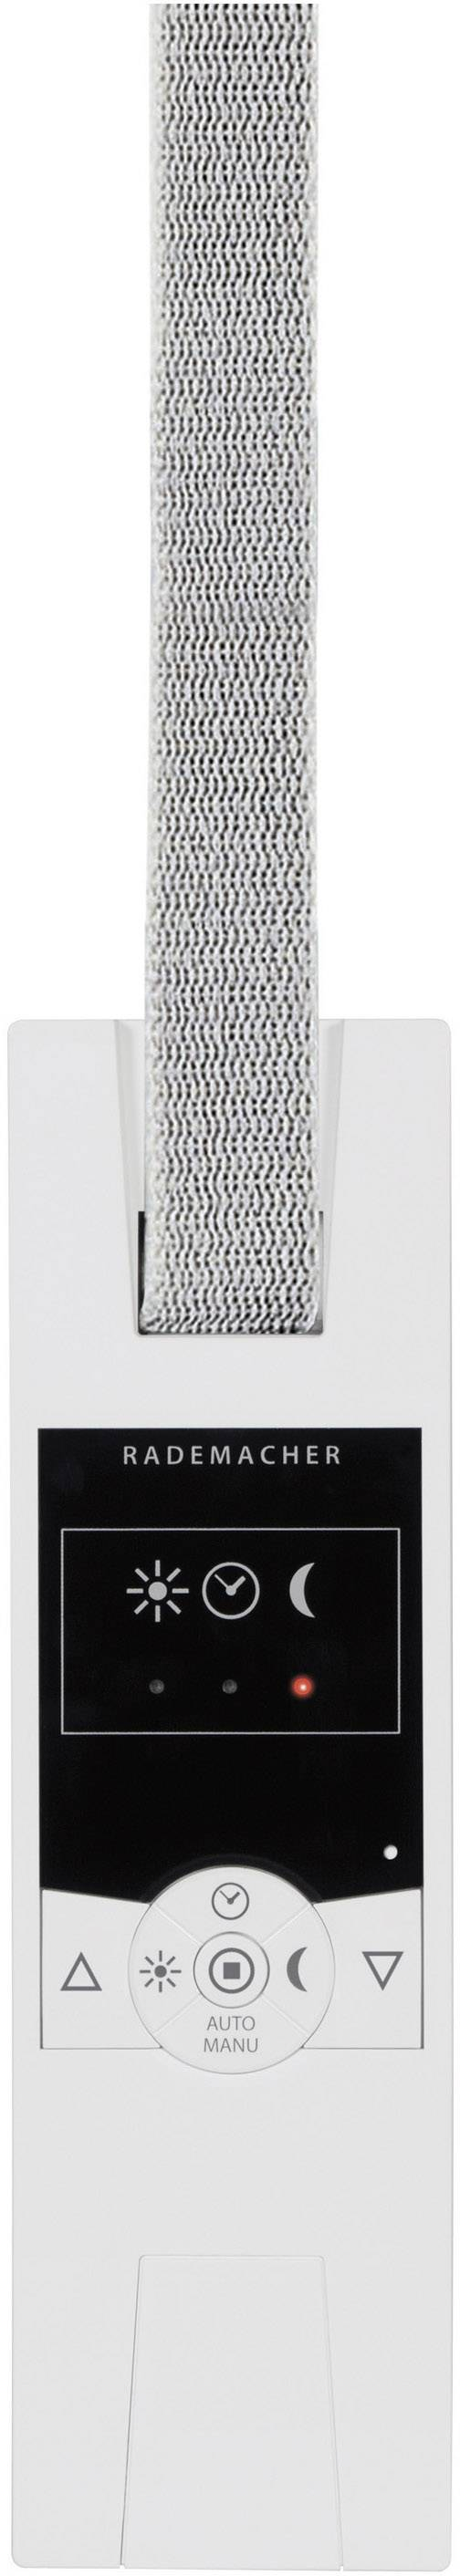 Elektrický navíjač roliet WR Rademacher RolloTron Standard